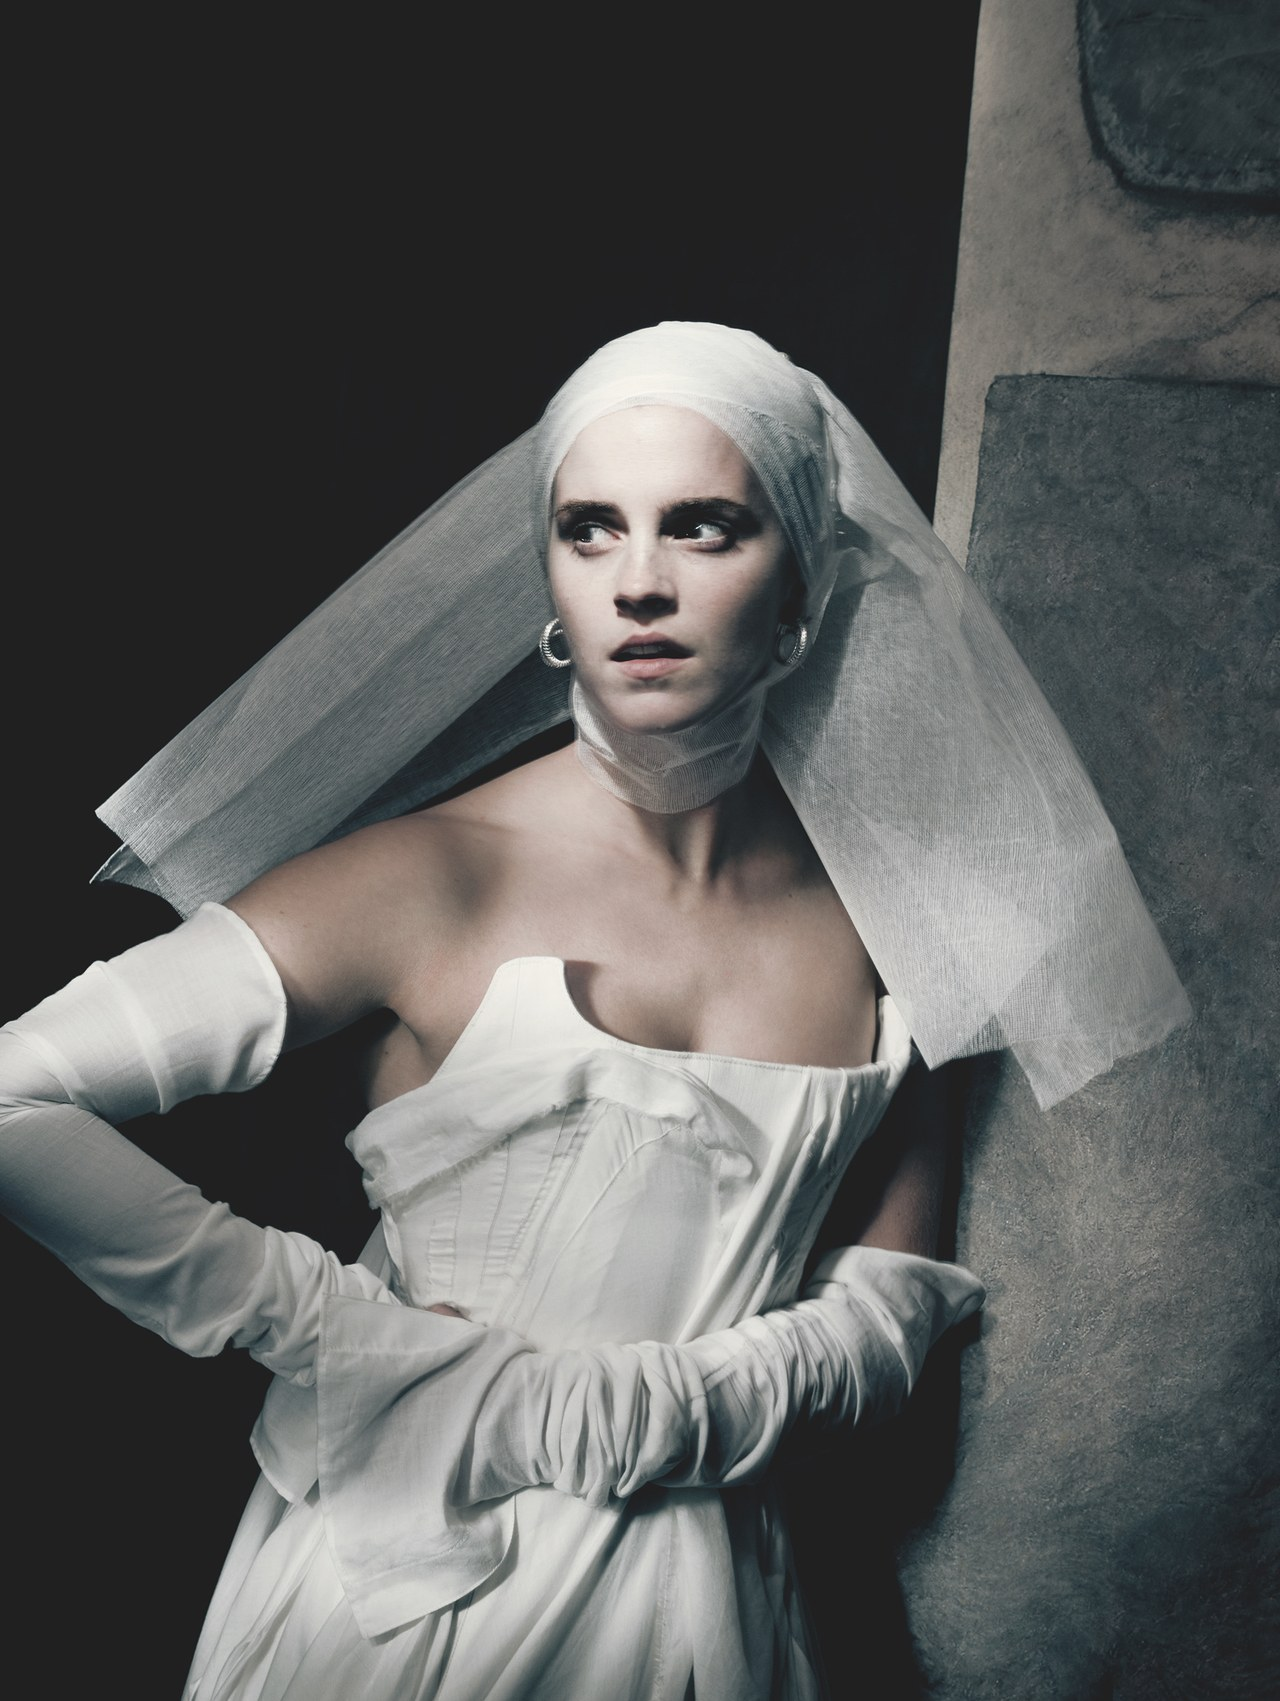 Pirelli 2020 Emma Watson - Neomag.